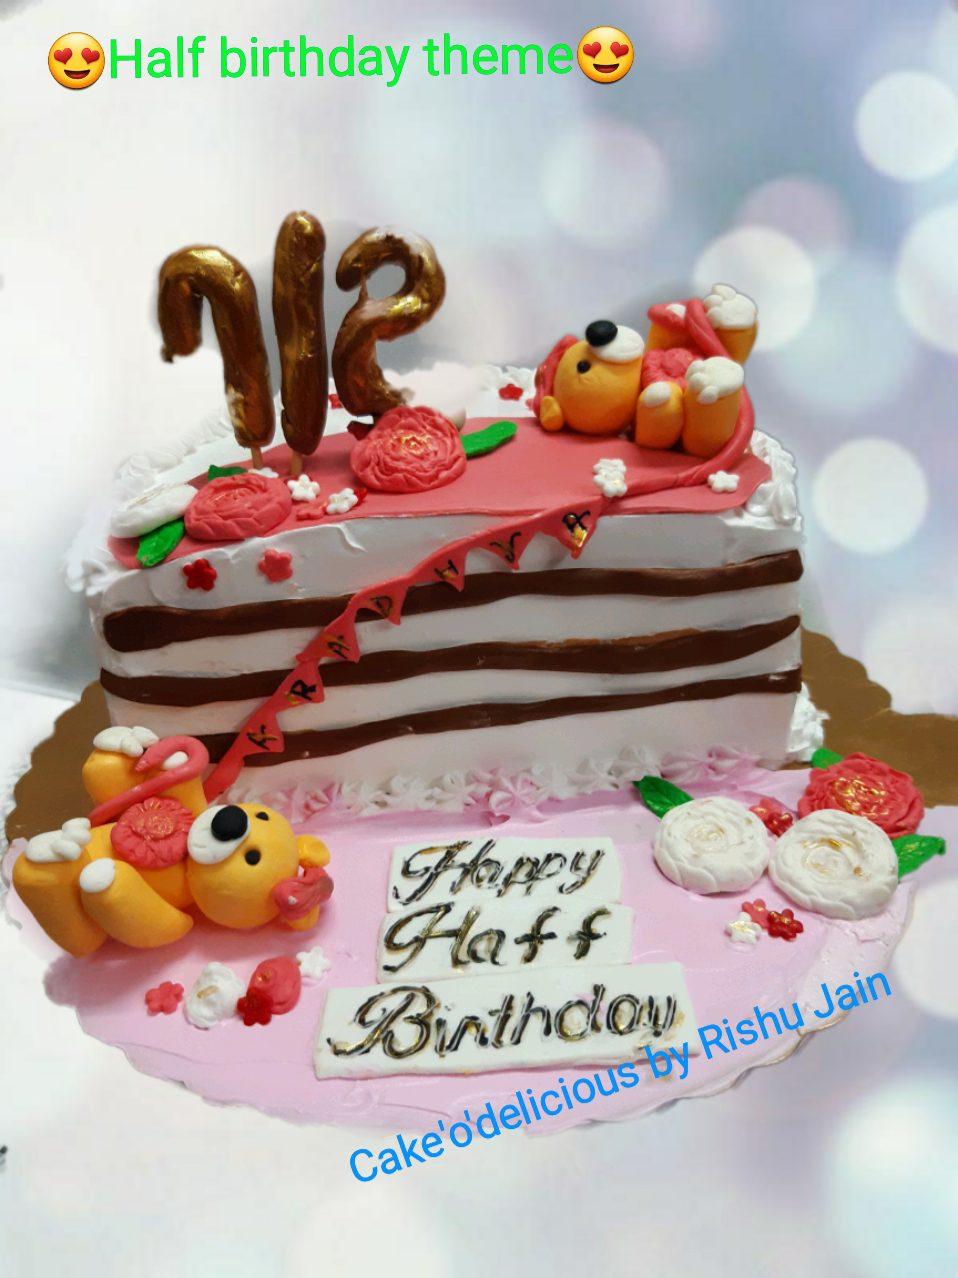 6 Month Birthday Cake Designs, Images, Price Near Me